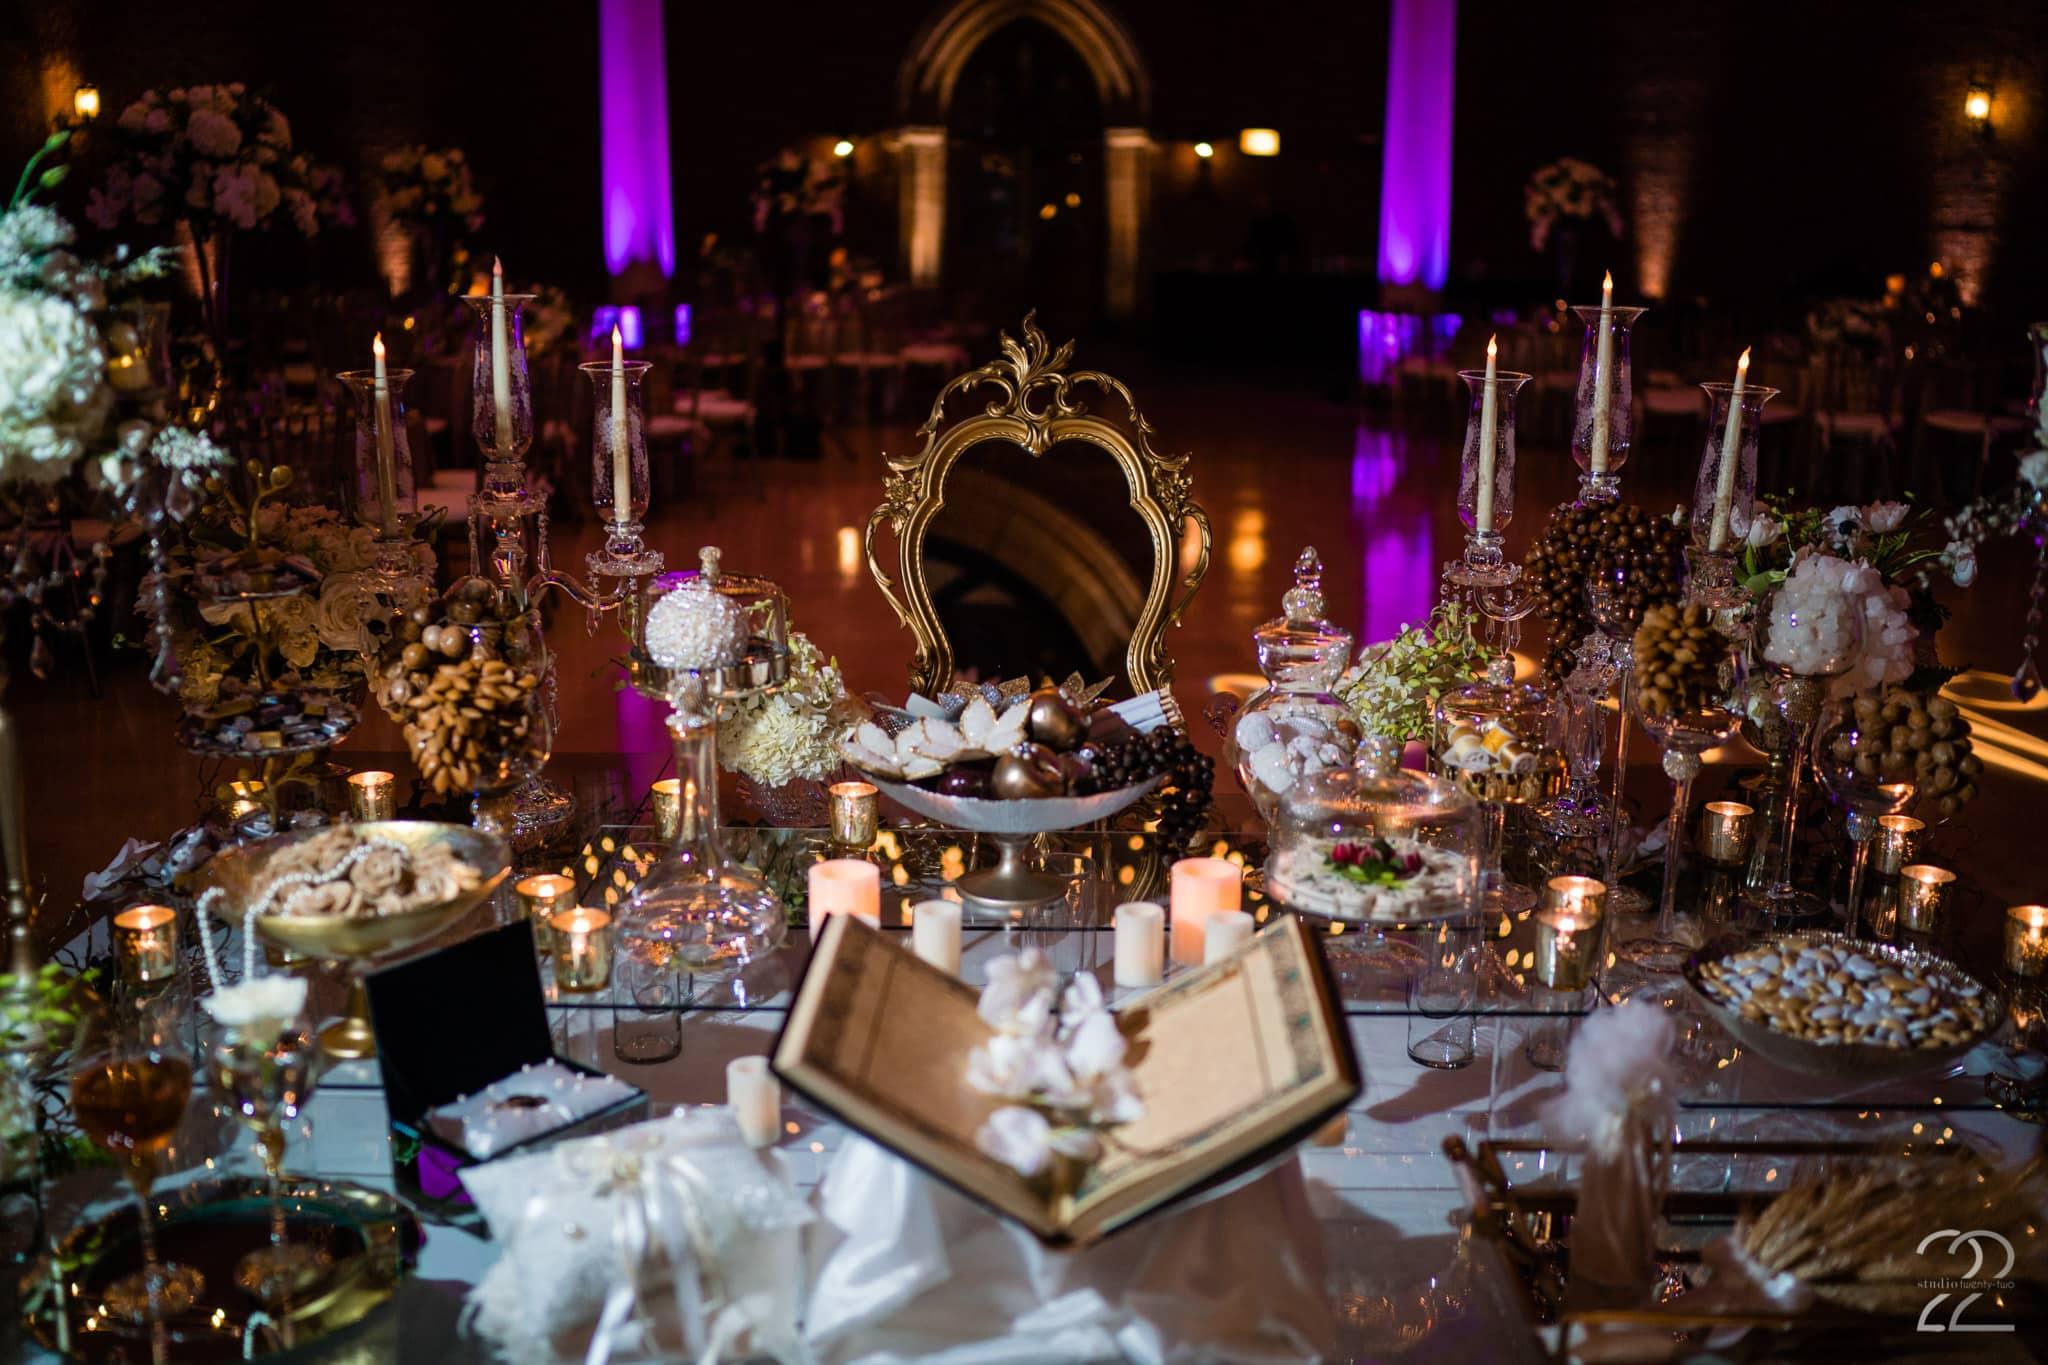 Soffreh Table Ideas - Dayton Art Institute Wedding Photos - Studio 22 Photography